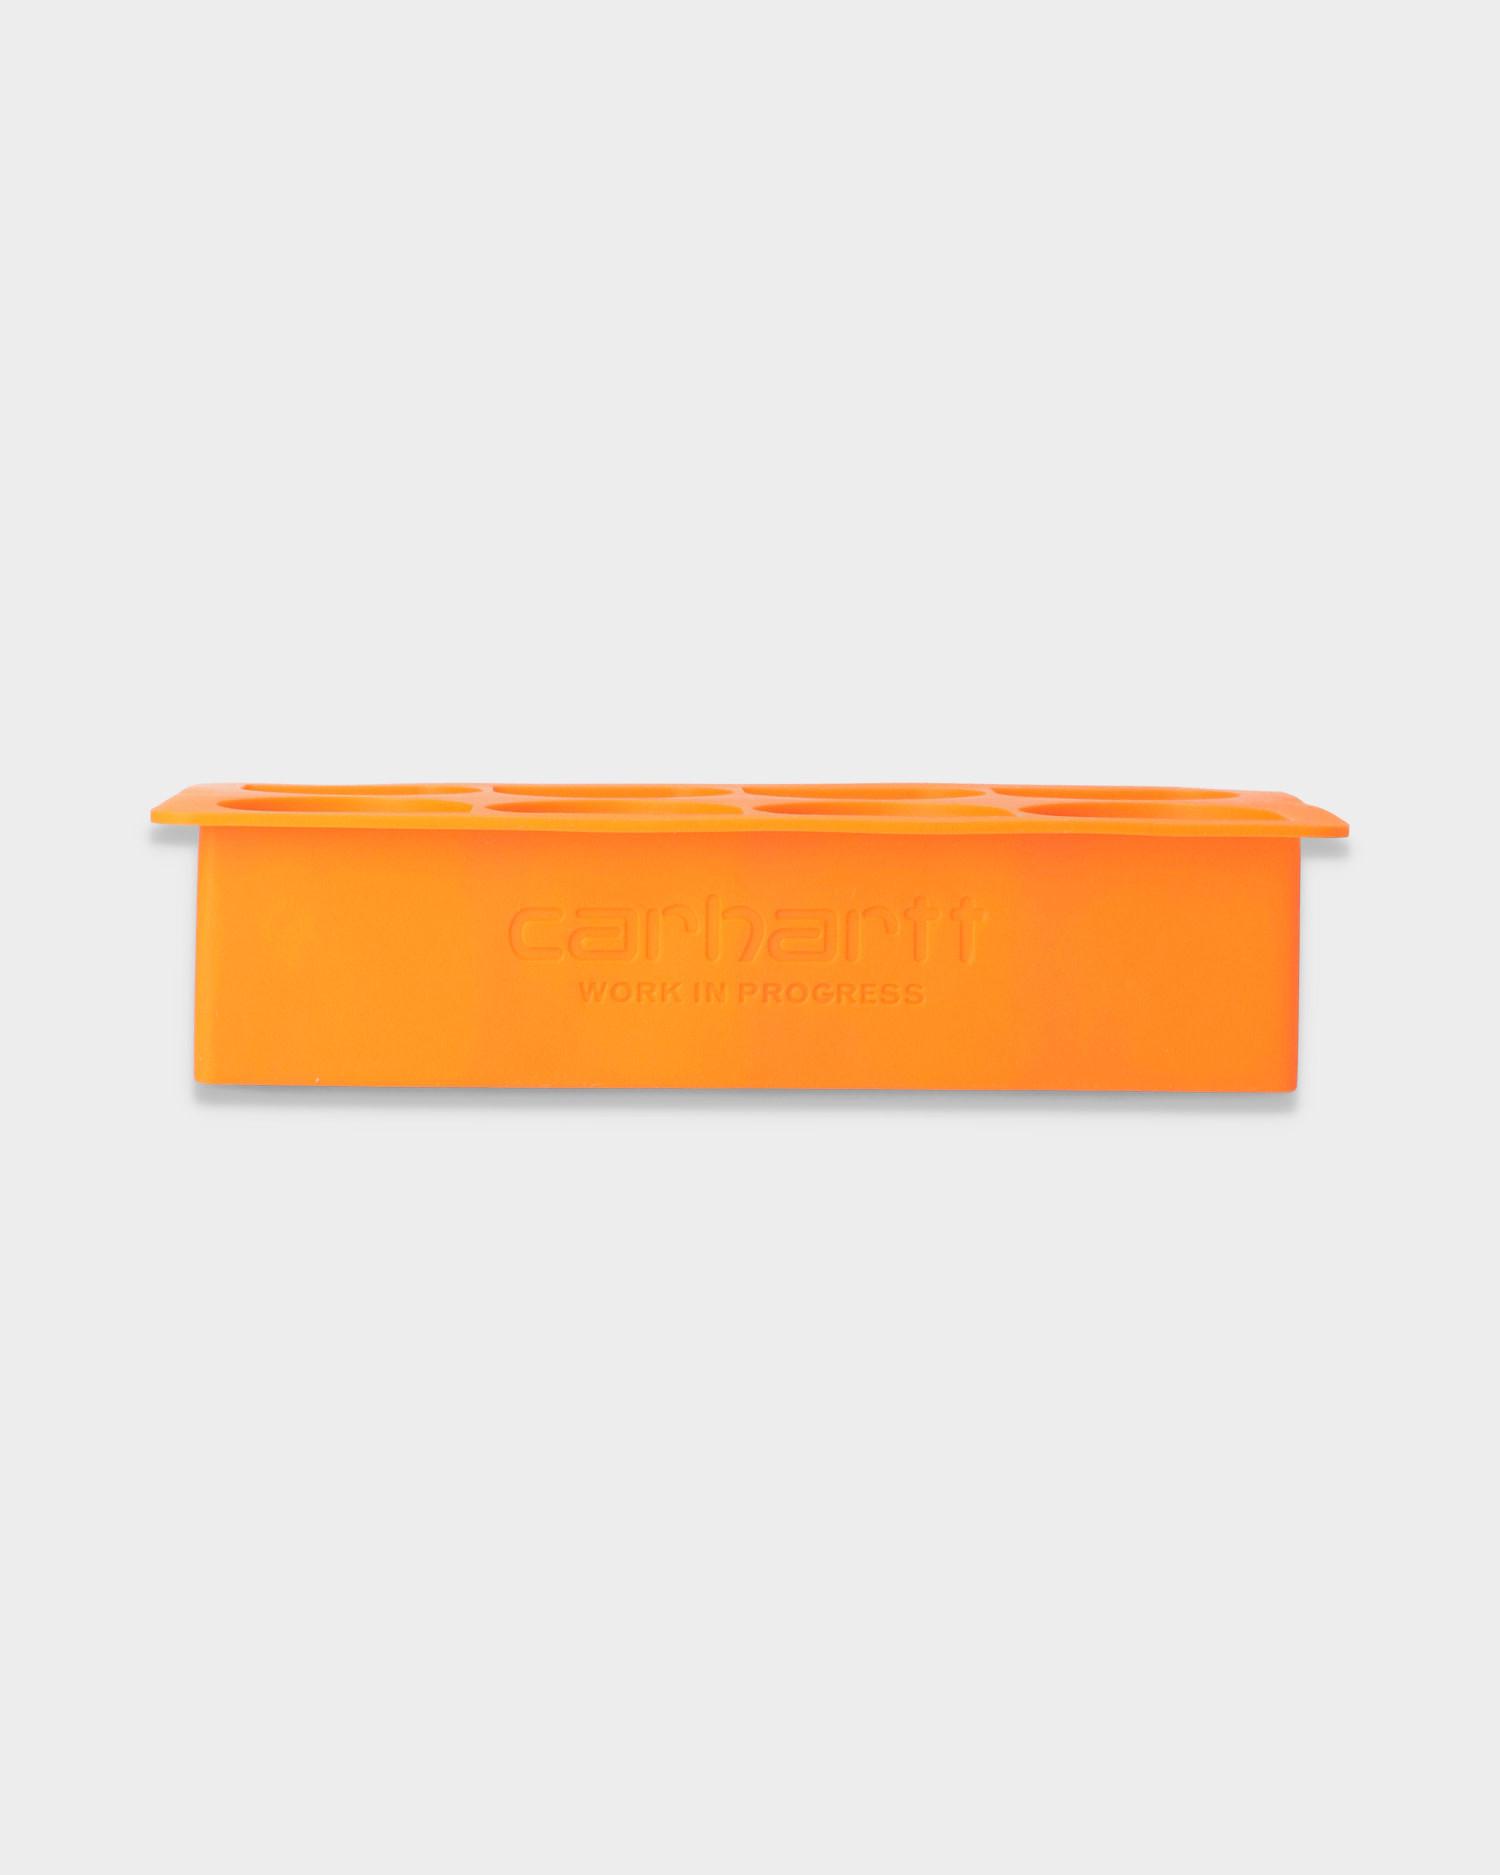 Carhartt WIP C logo Ice Cube Tray Orange